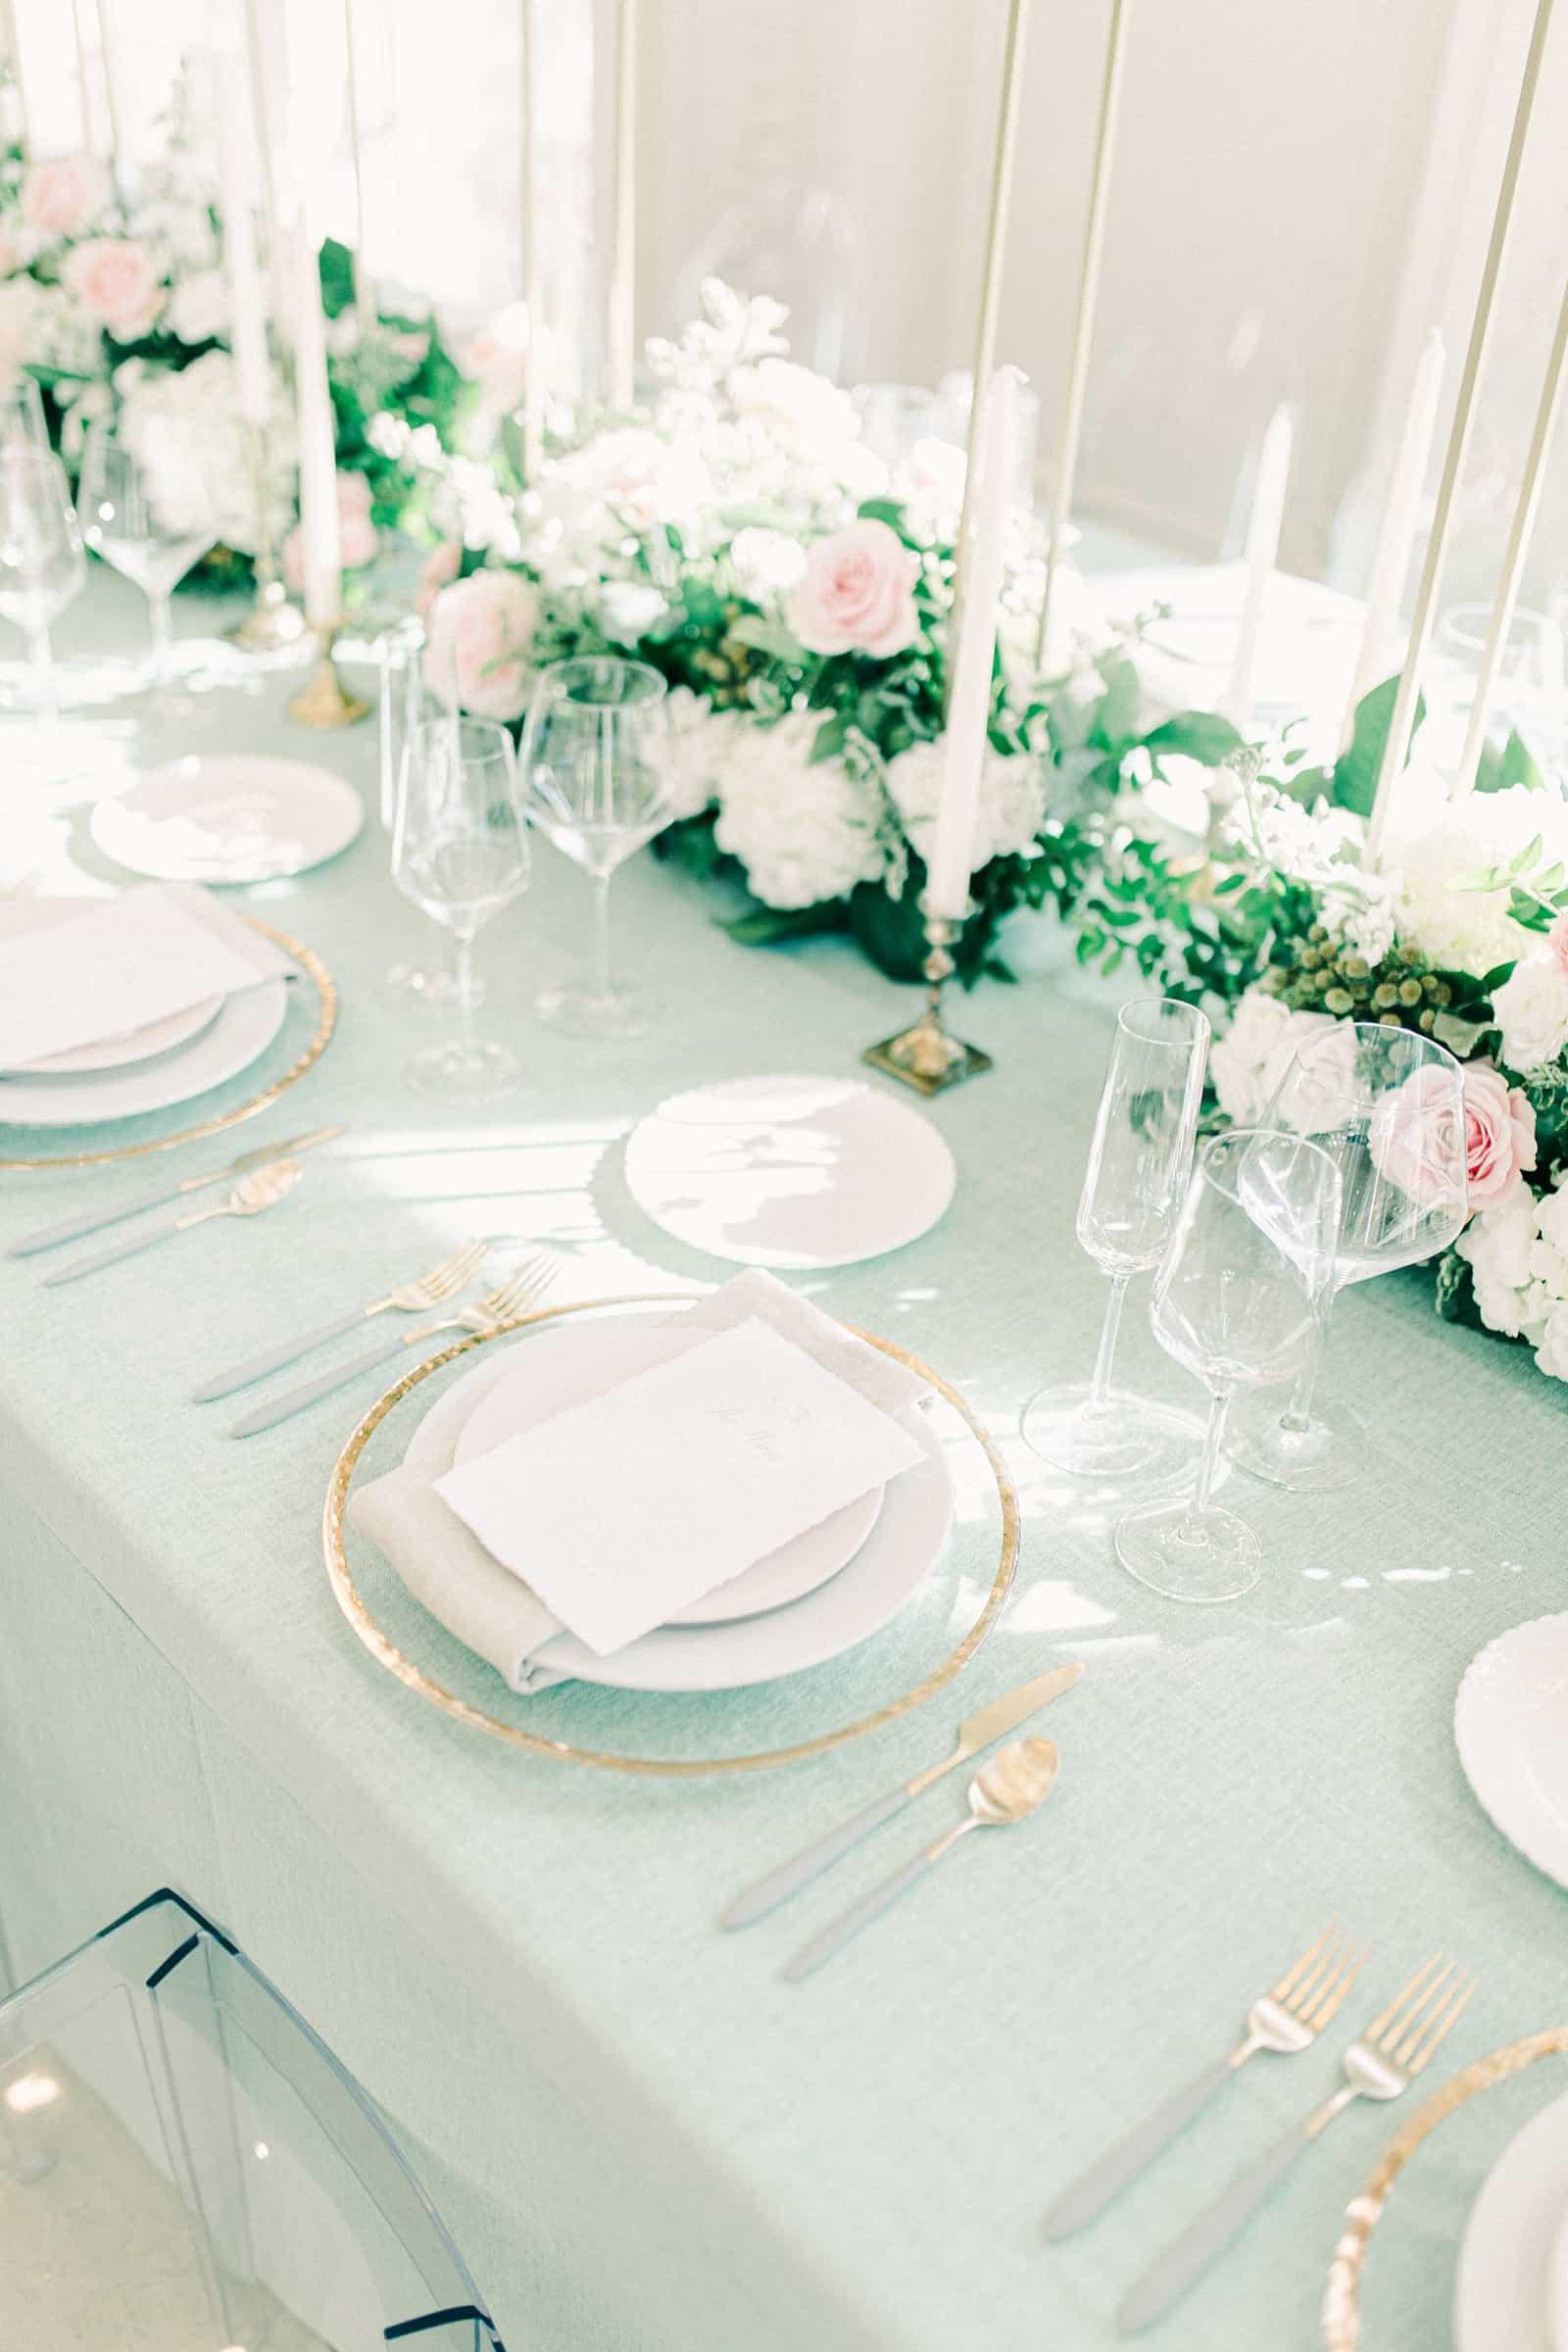 Wedding reception decor, gold rimmed dinner plates on light blue tablecloths